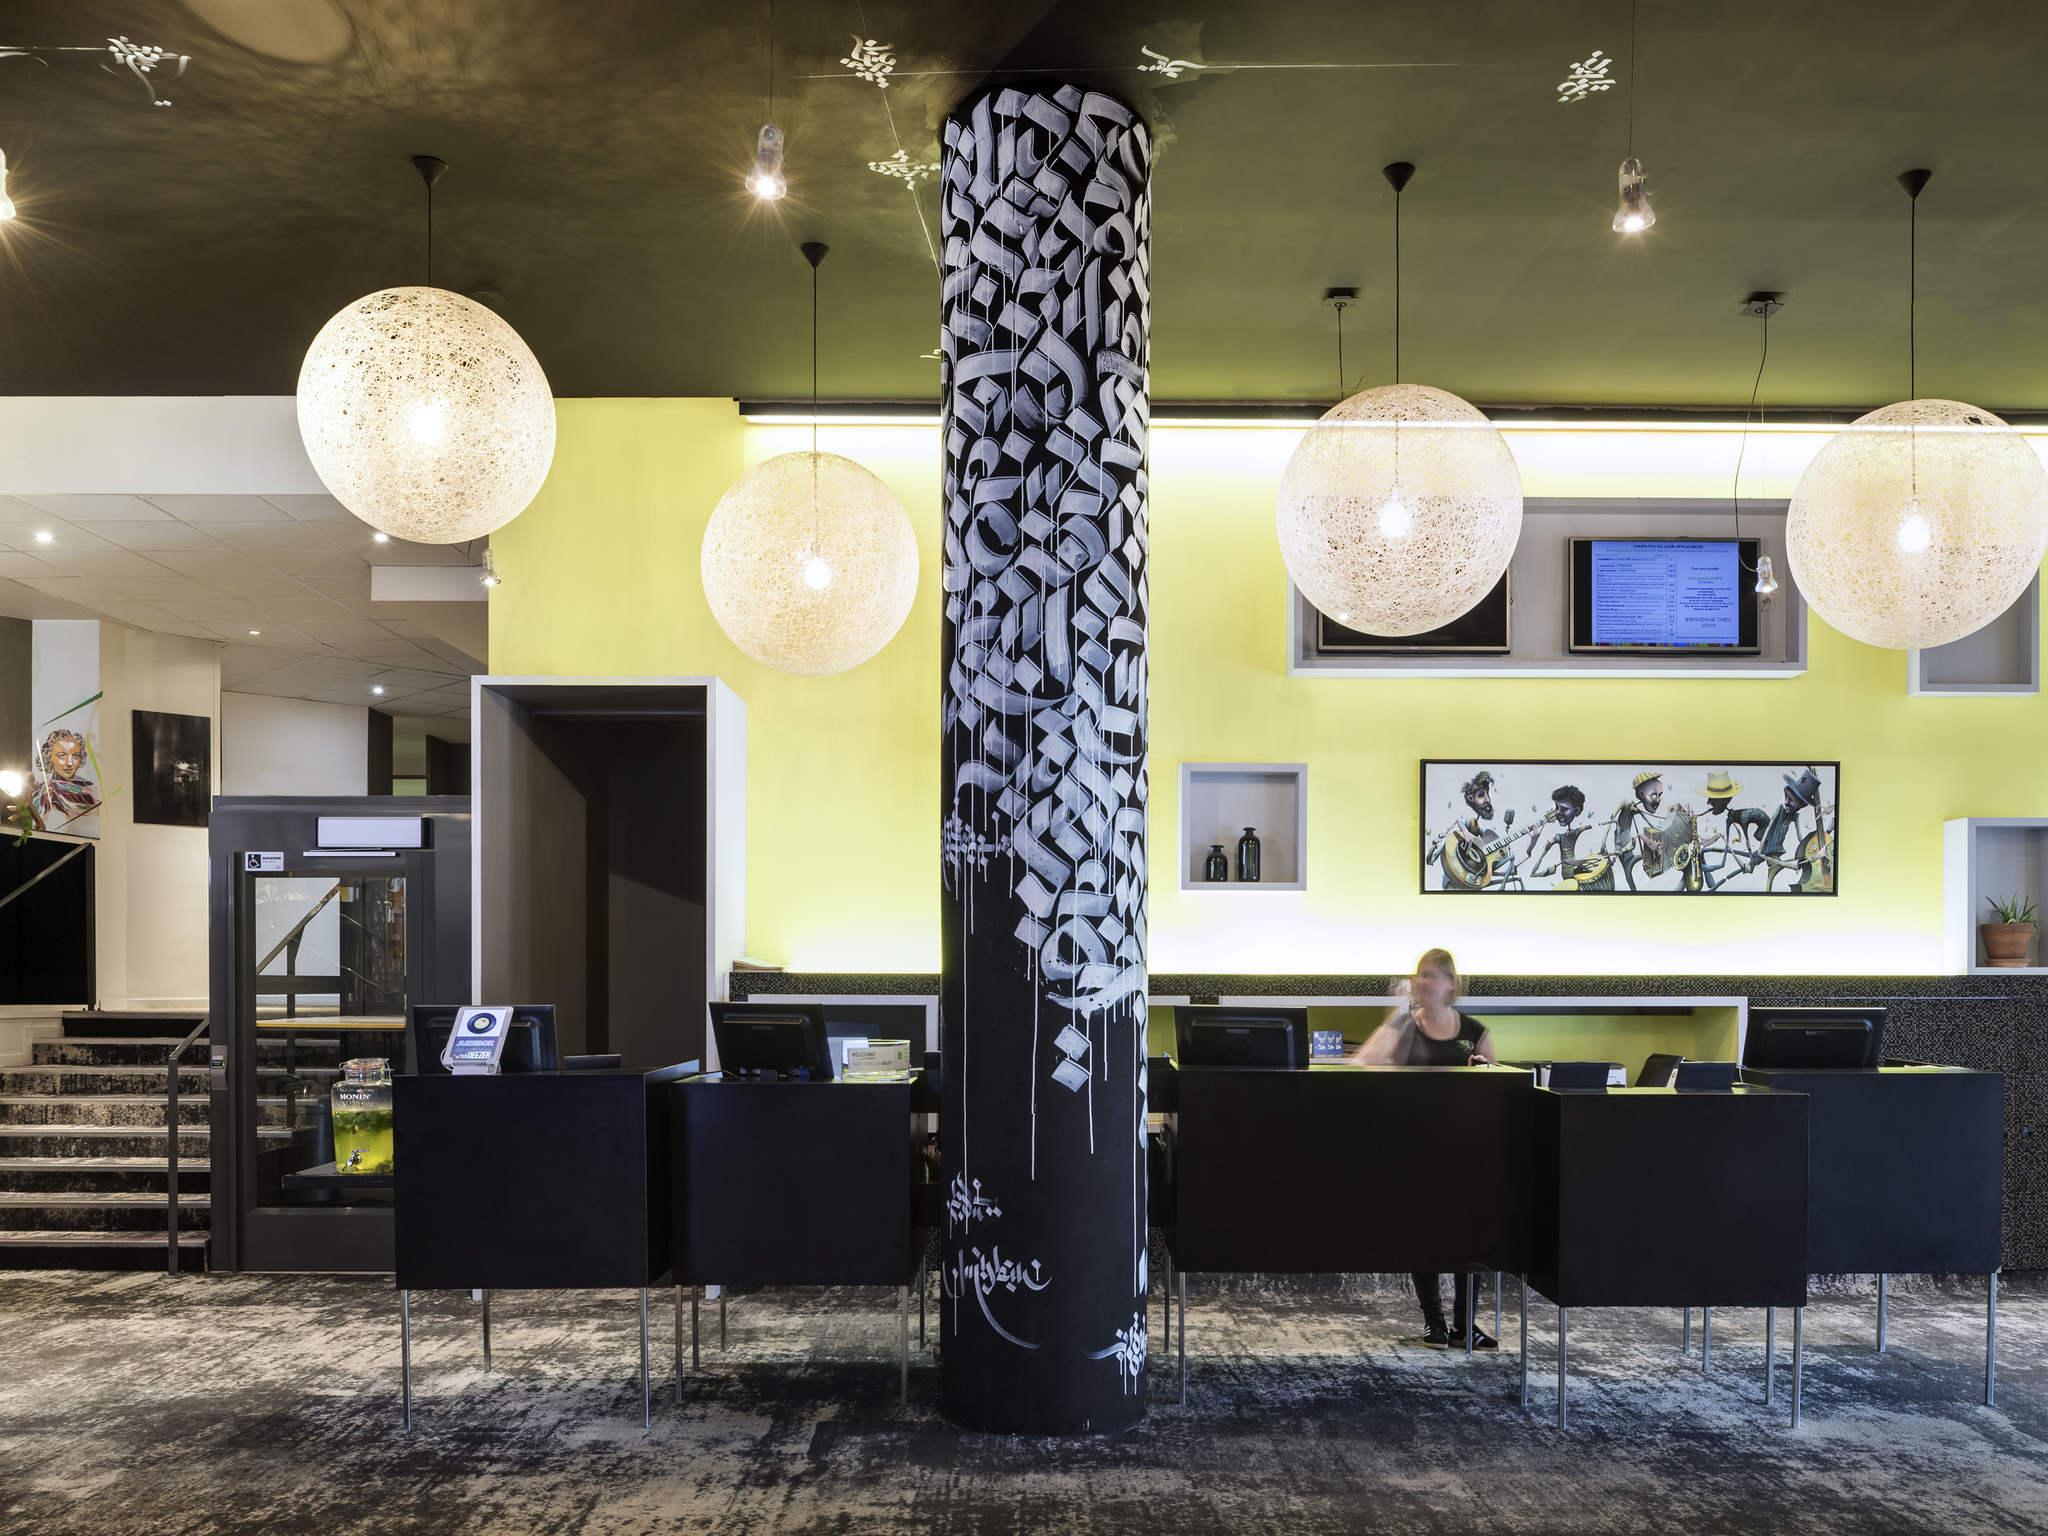 Hotel Ibis Styles Paris Bercy